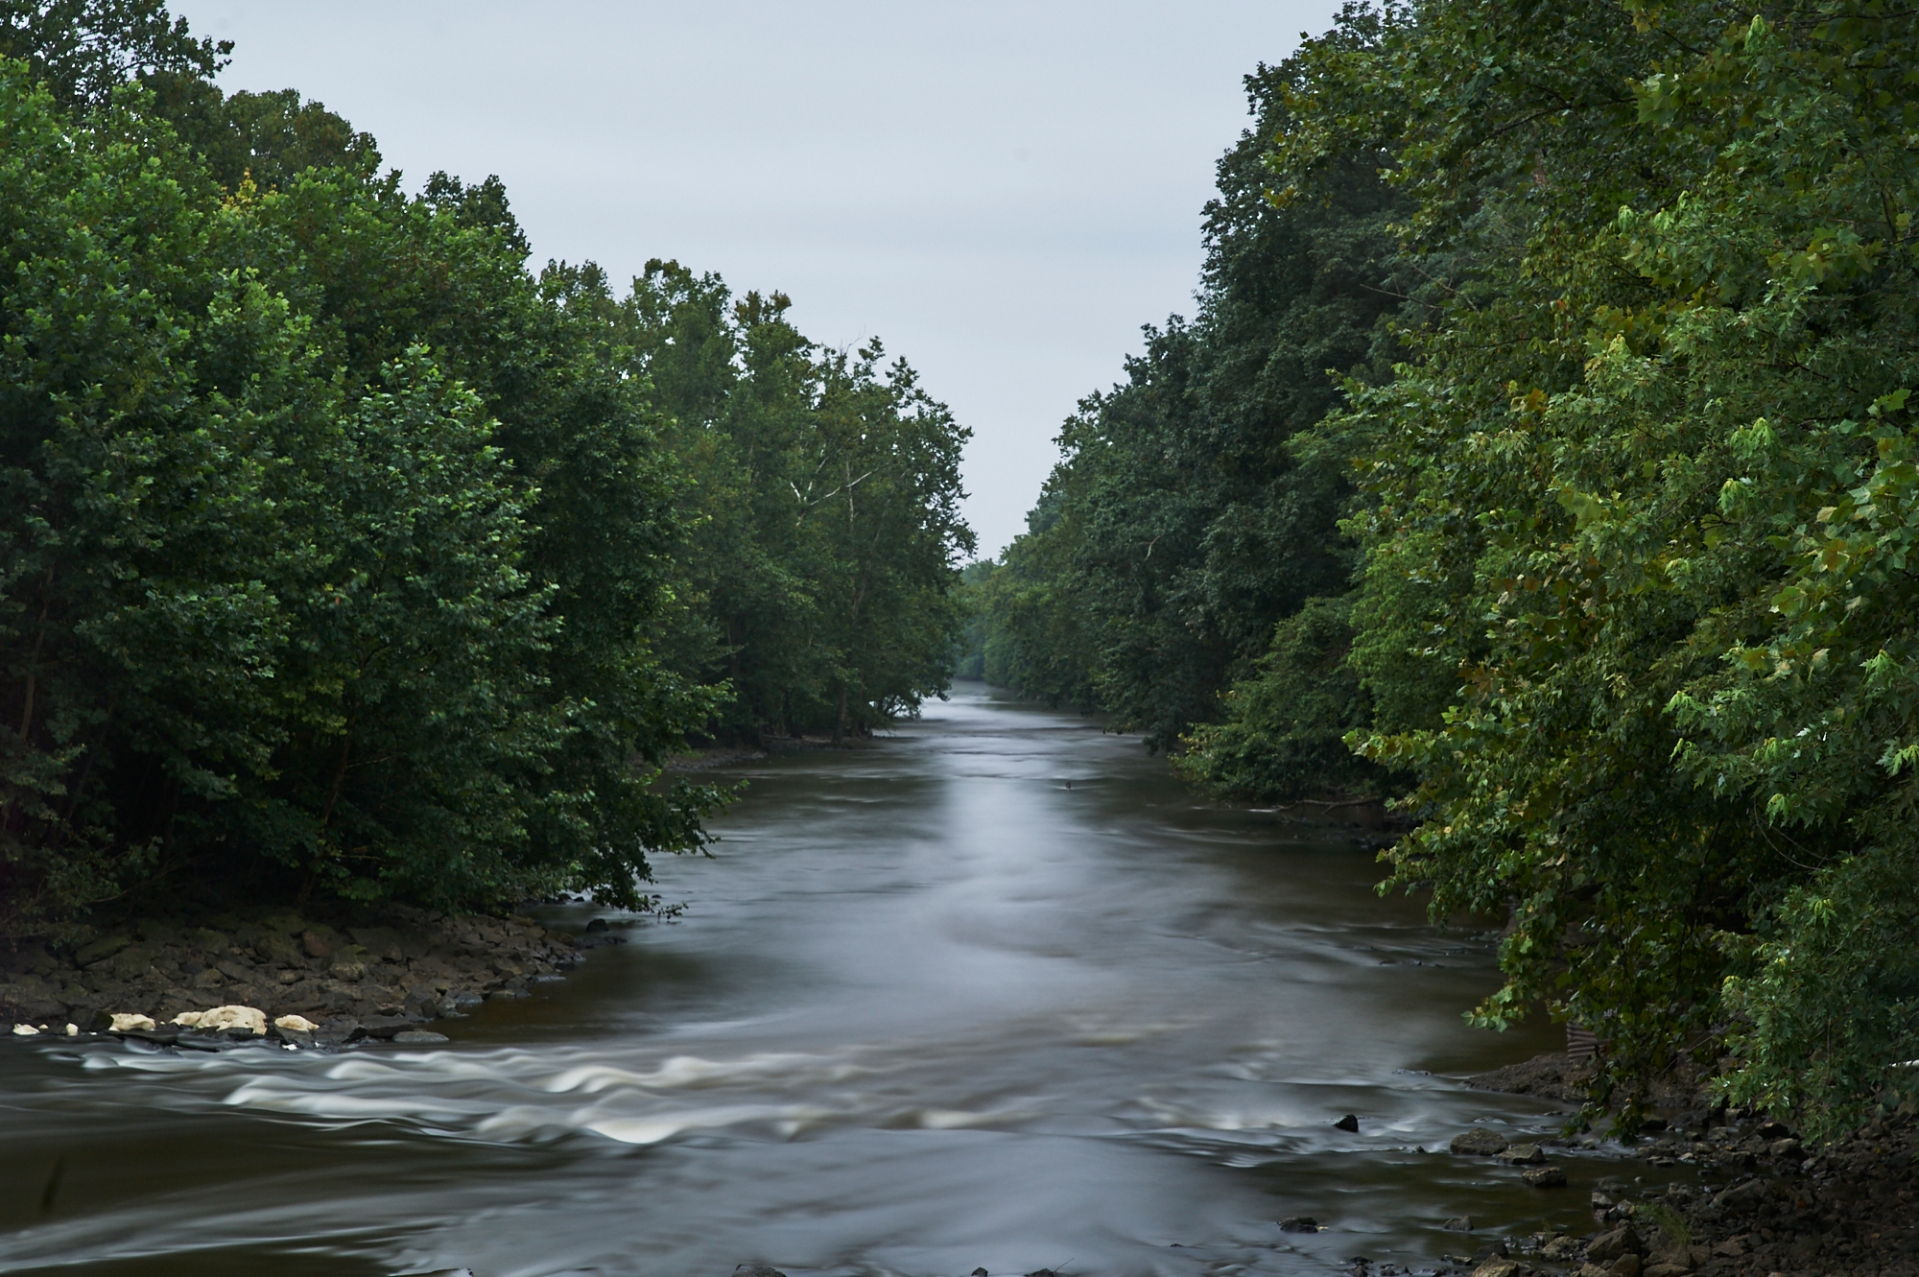 Tamron-24-70-G2-Review-Scioto-River-Dam-3